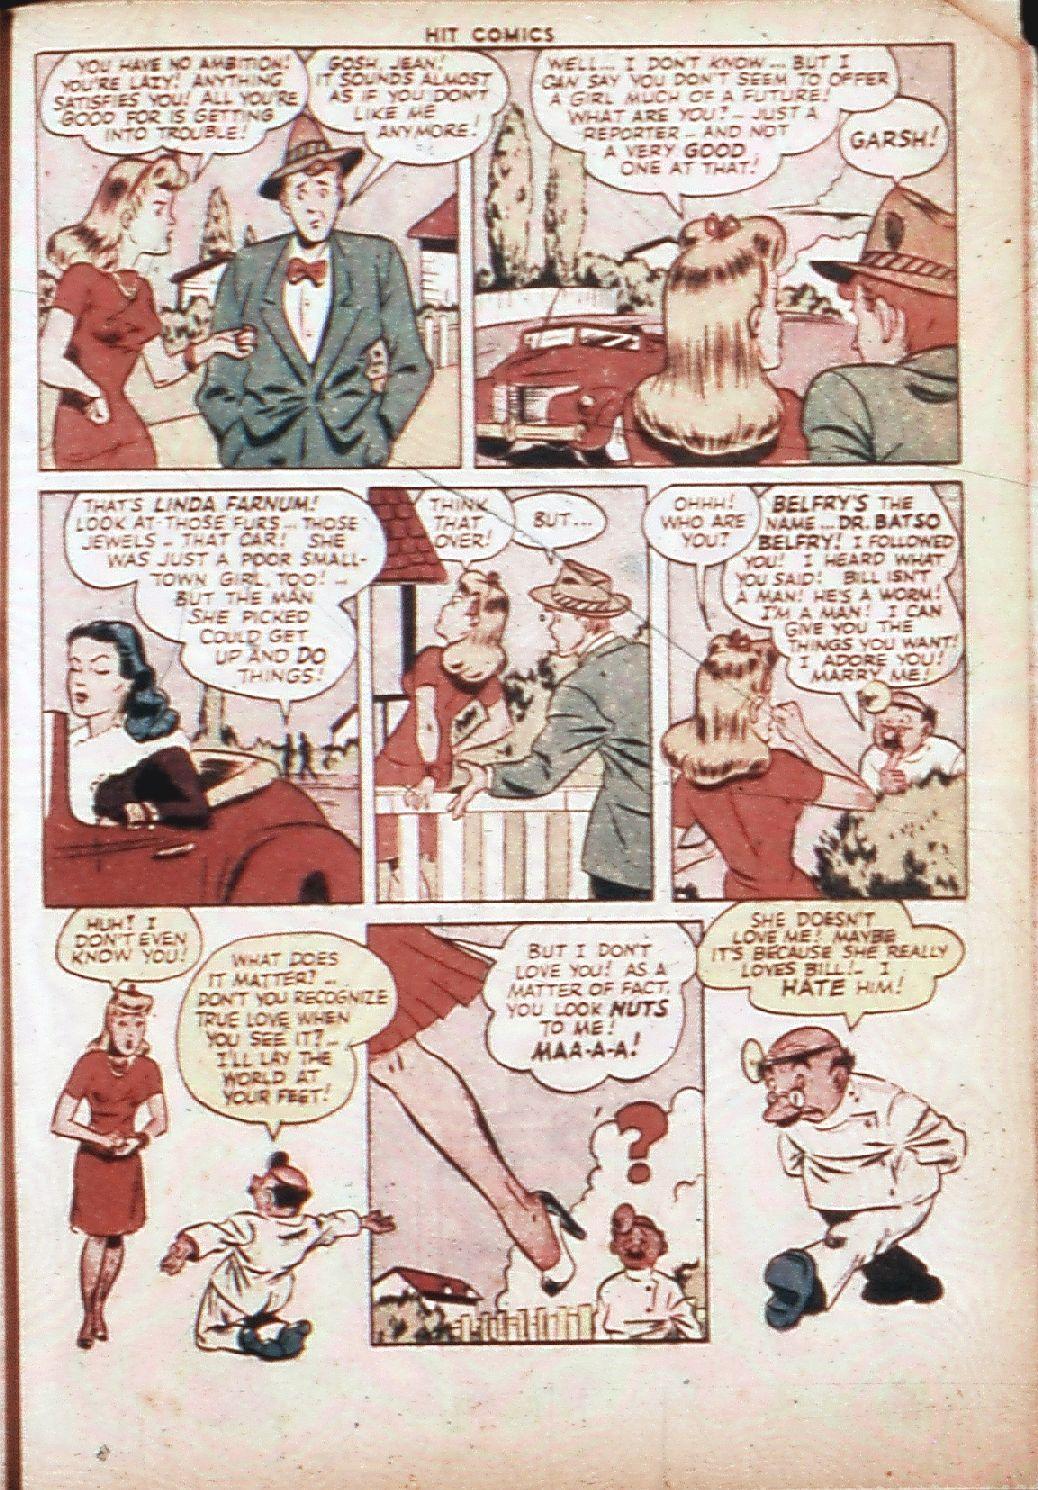 Read online Hit Comics comic -  Issue #30 - 50